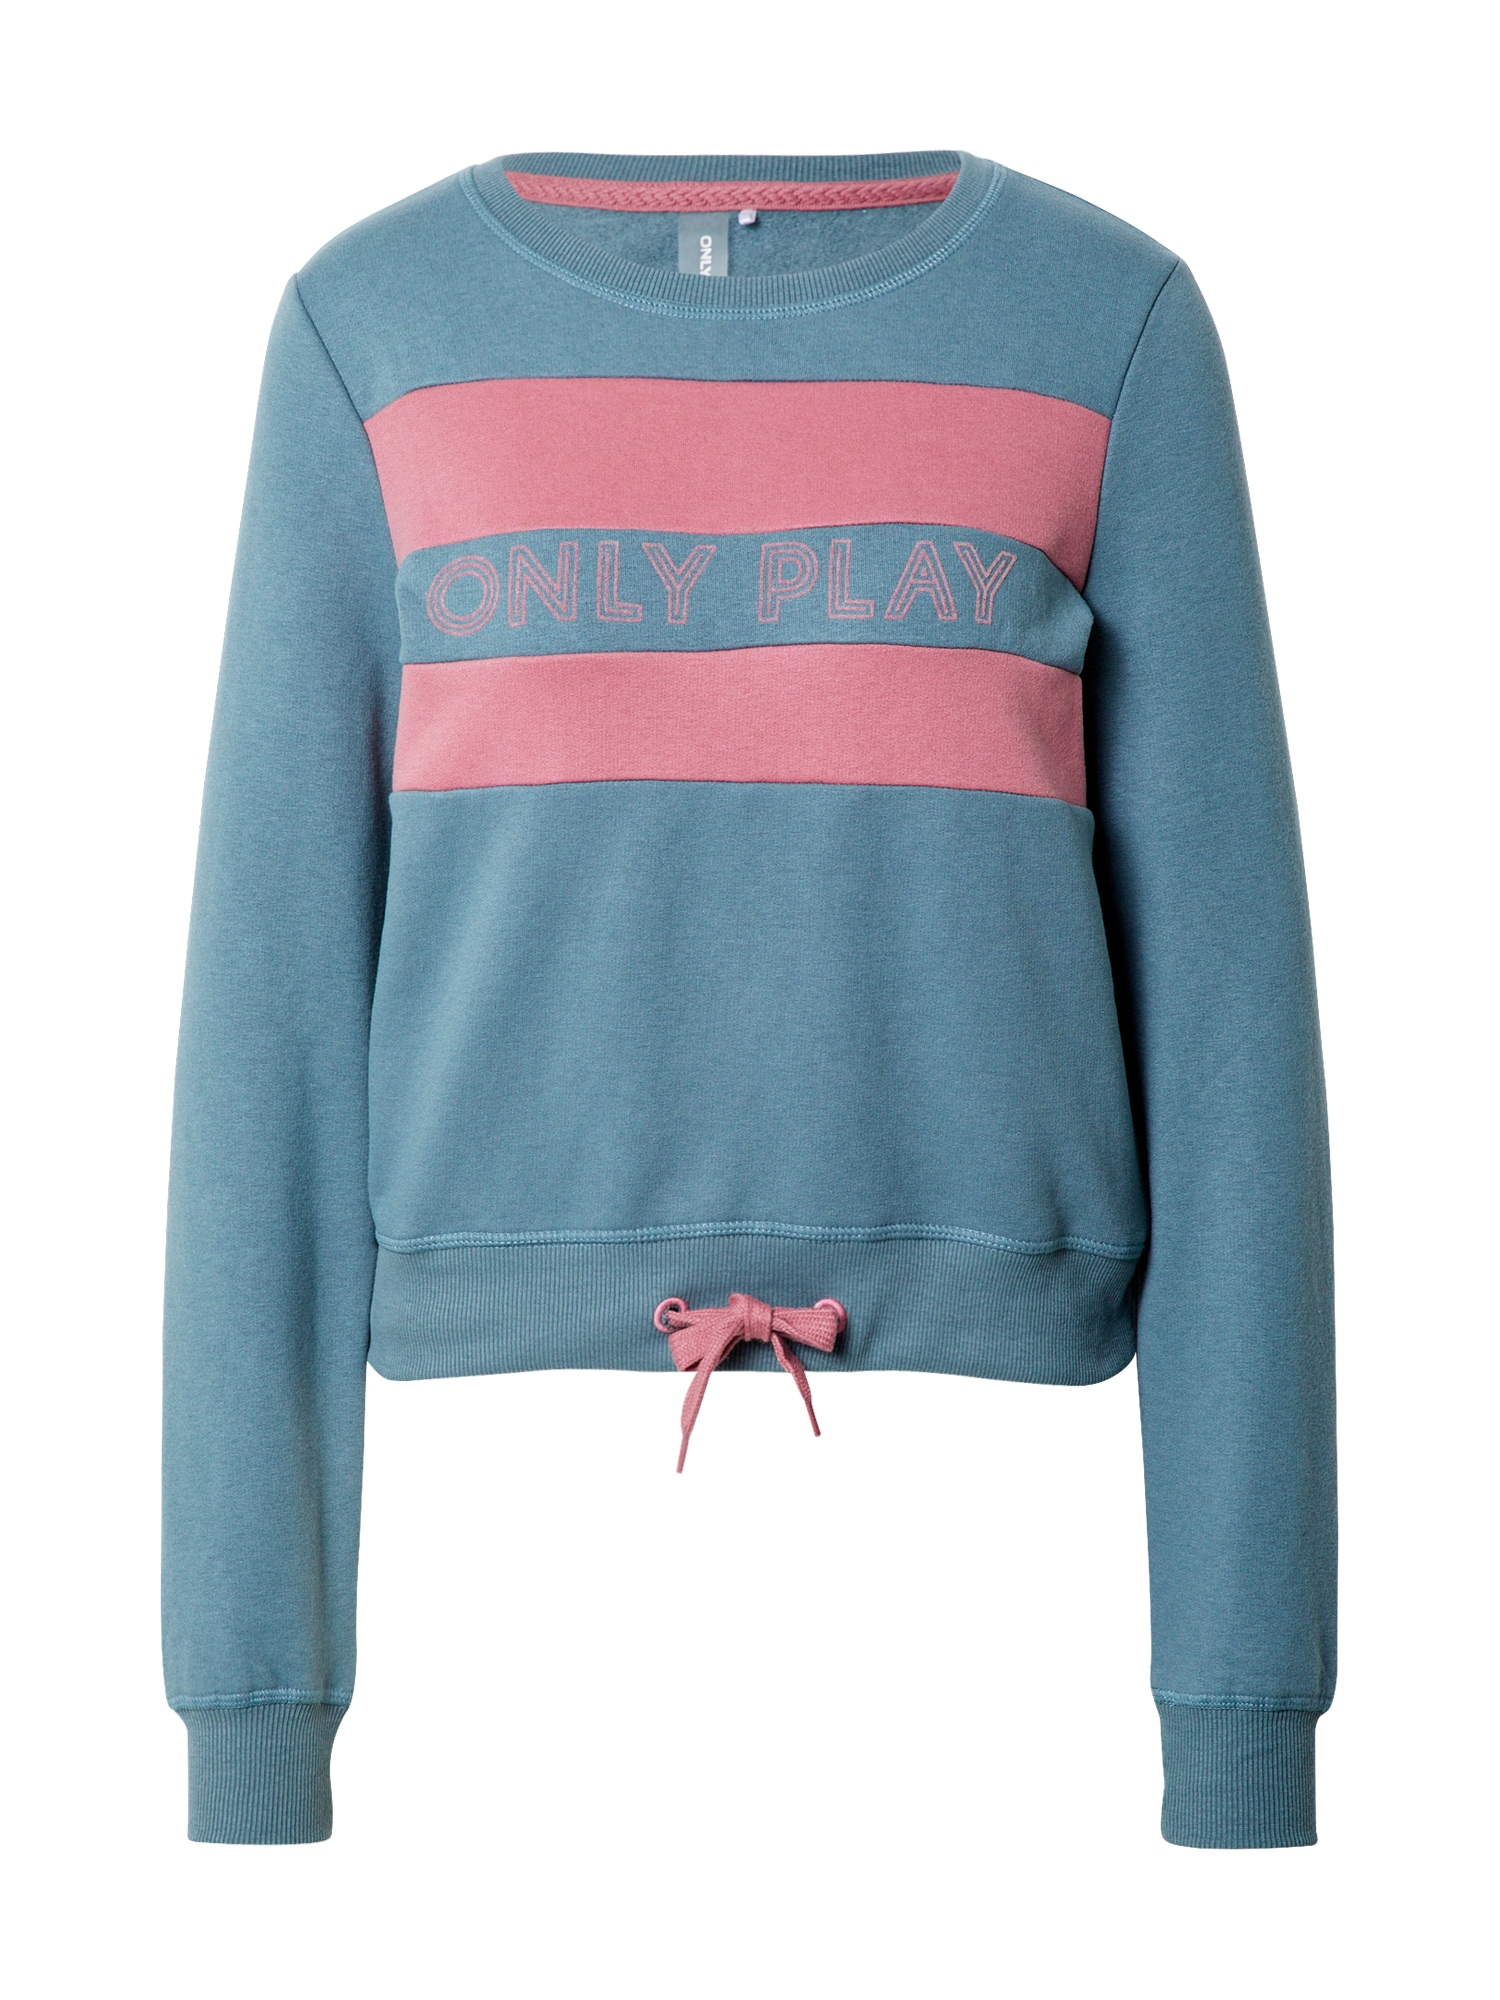 ONLY PLAY Sportinio tipo megztinis